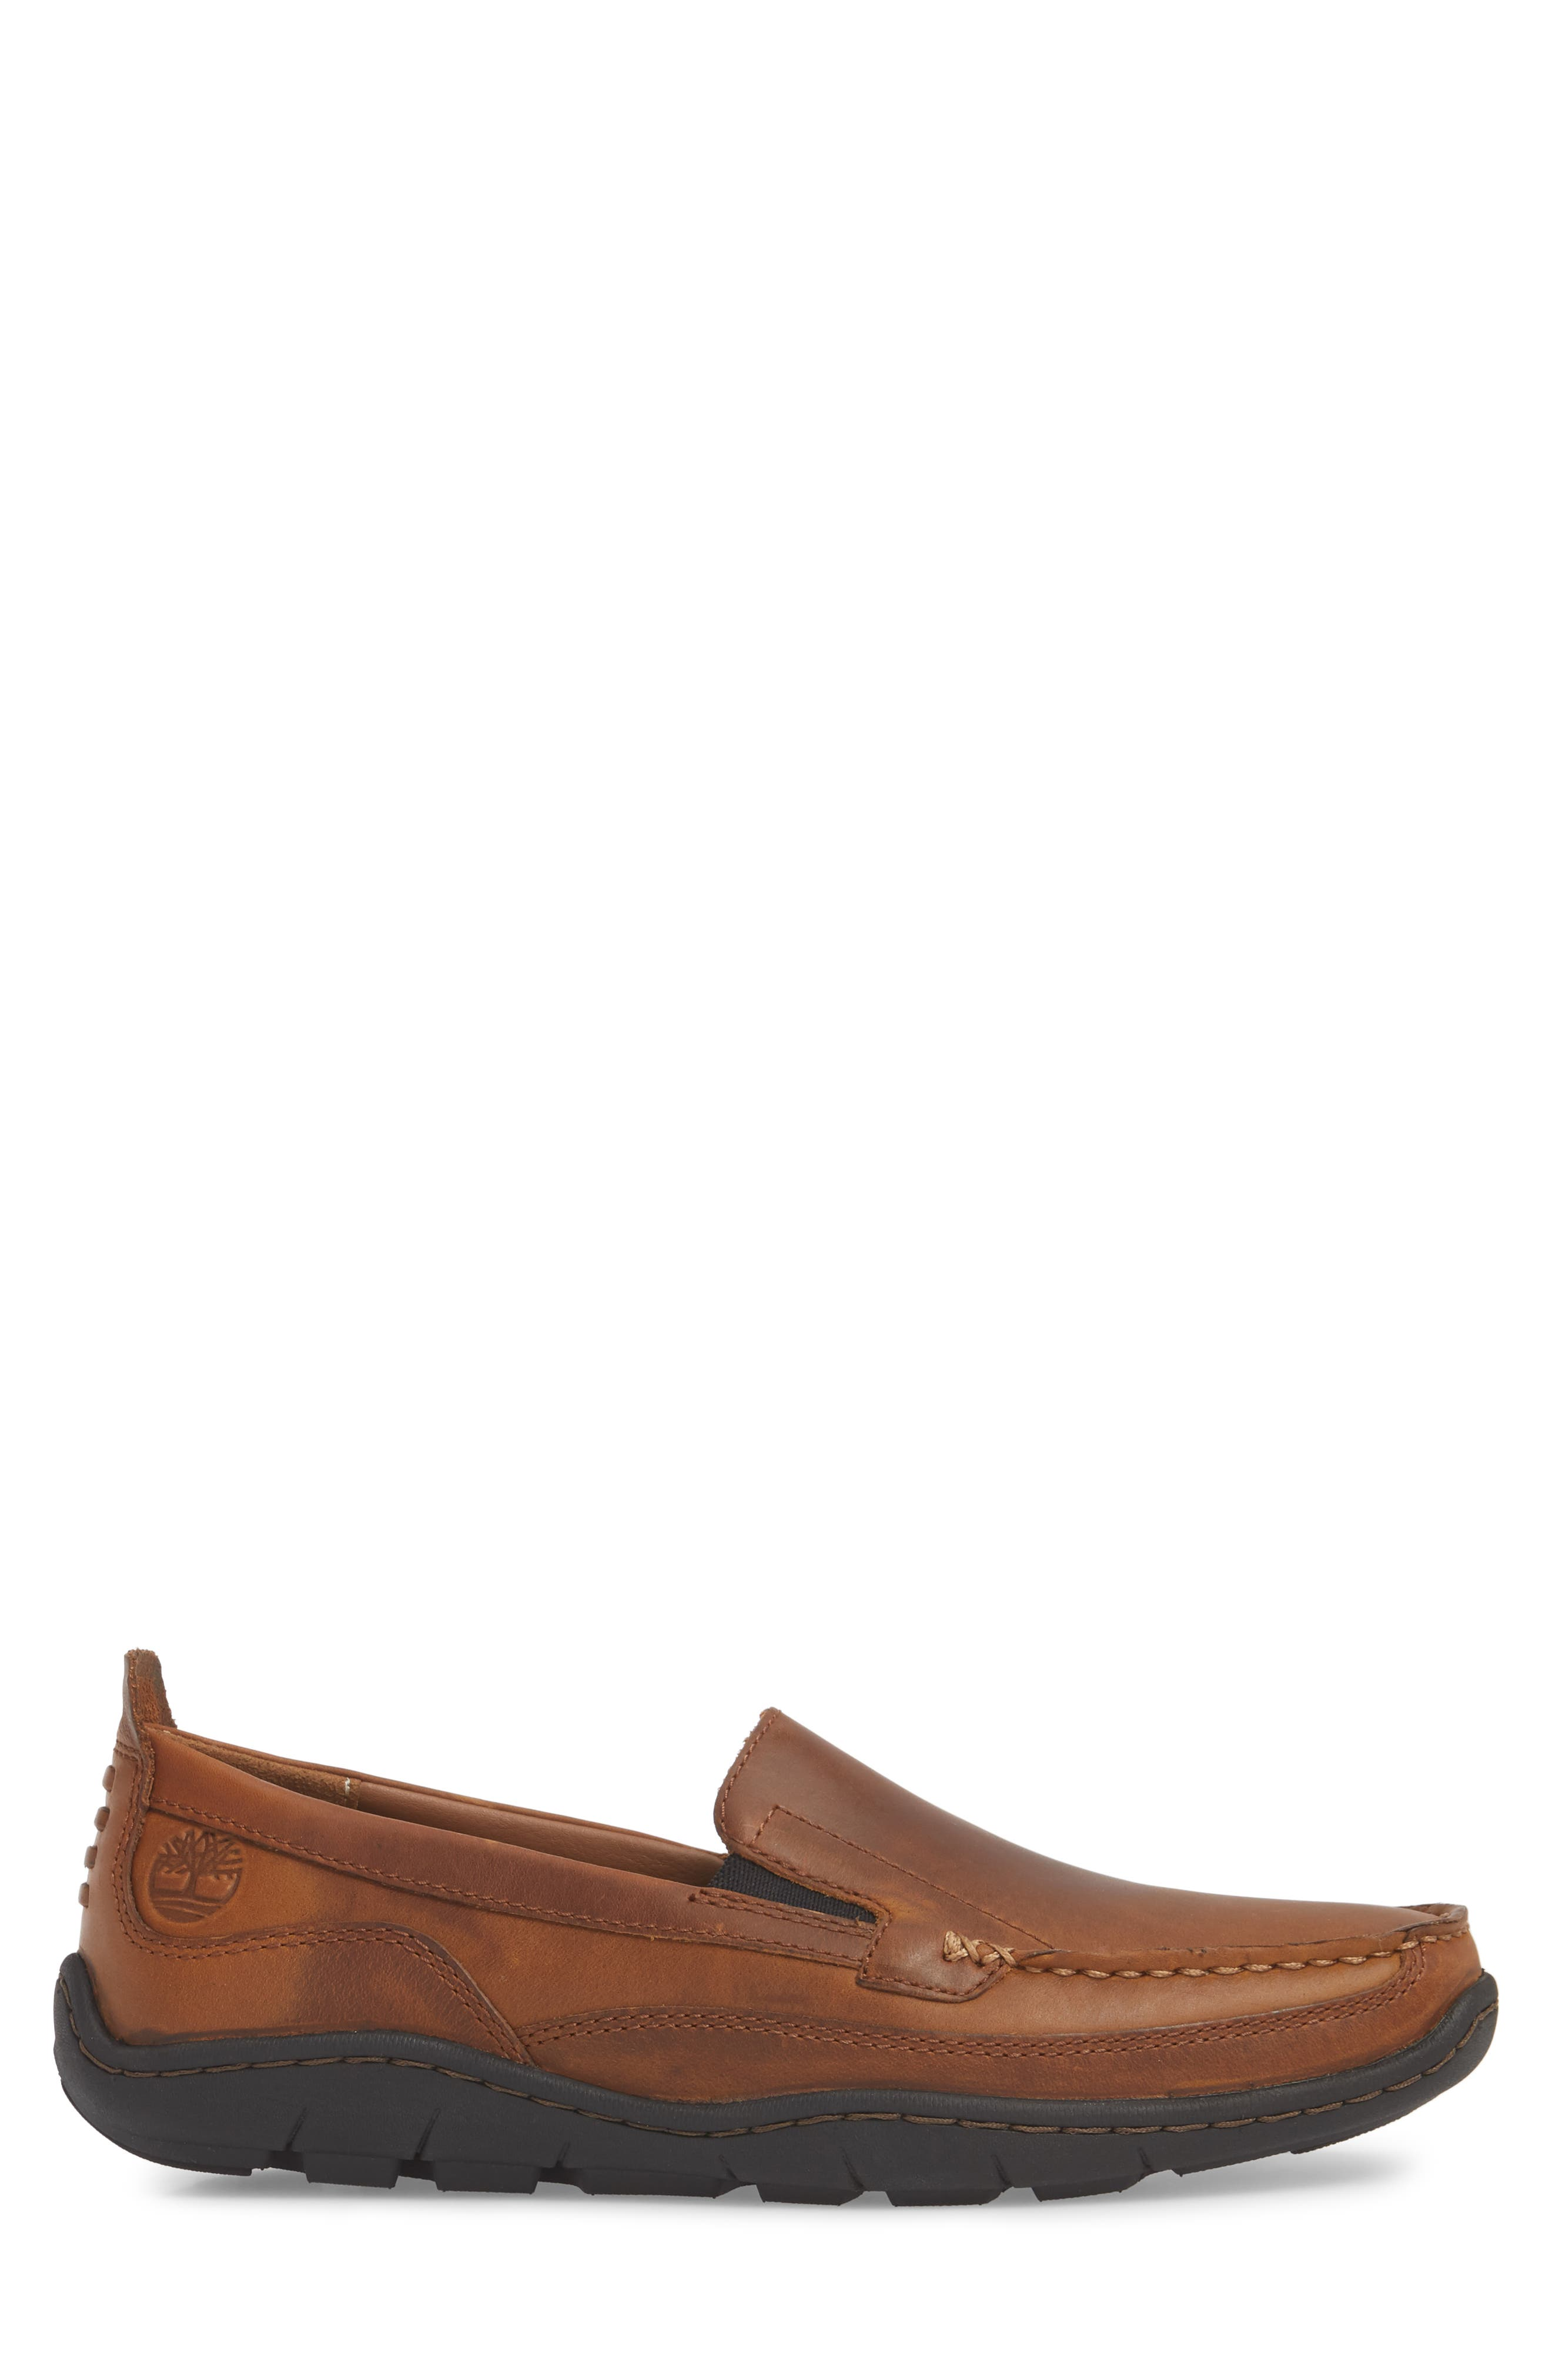 Sandspoint Venetian Loafer,                             Alternate thumbnail 3, color,                             Tan Old Harness